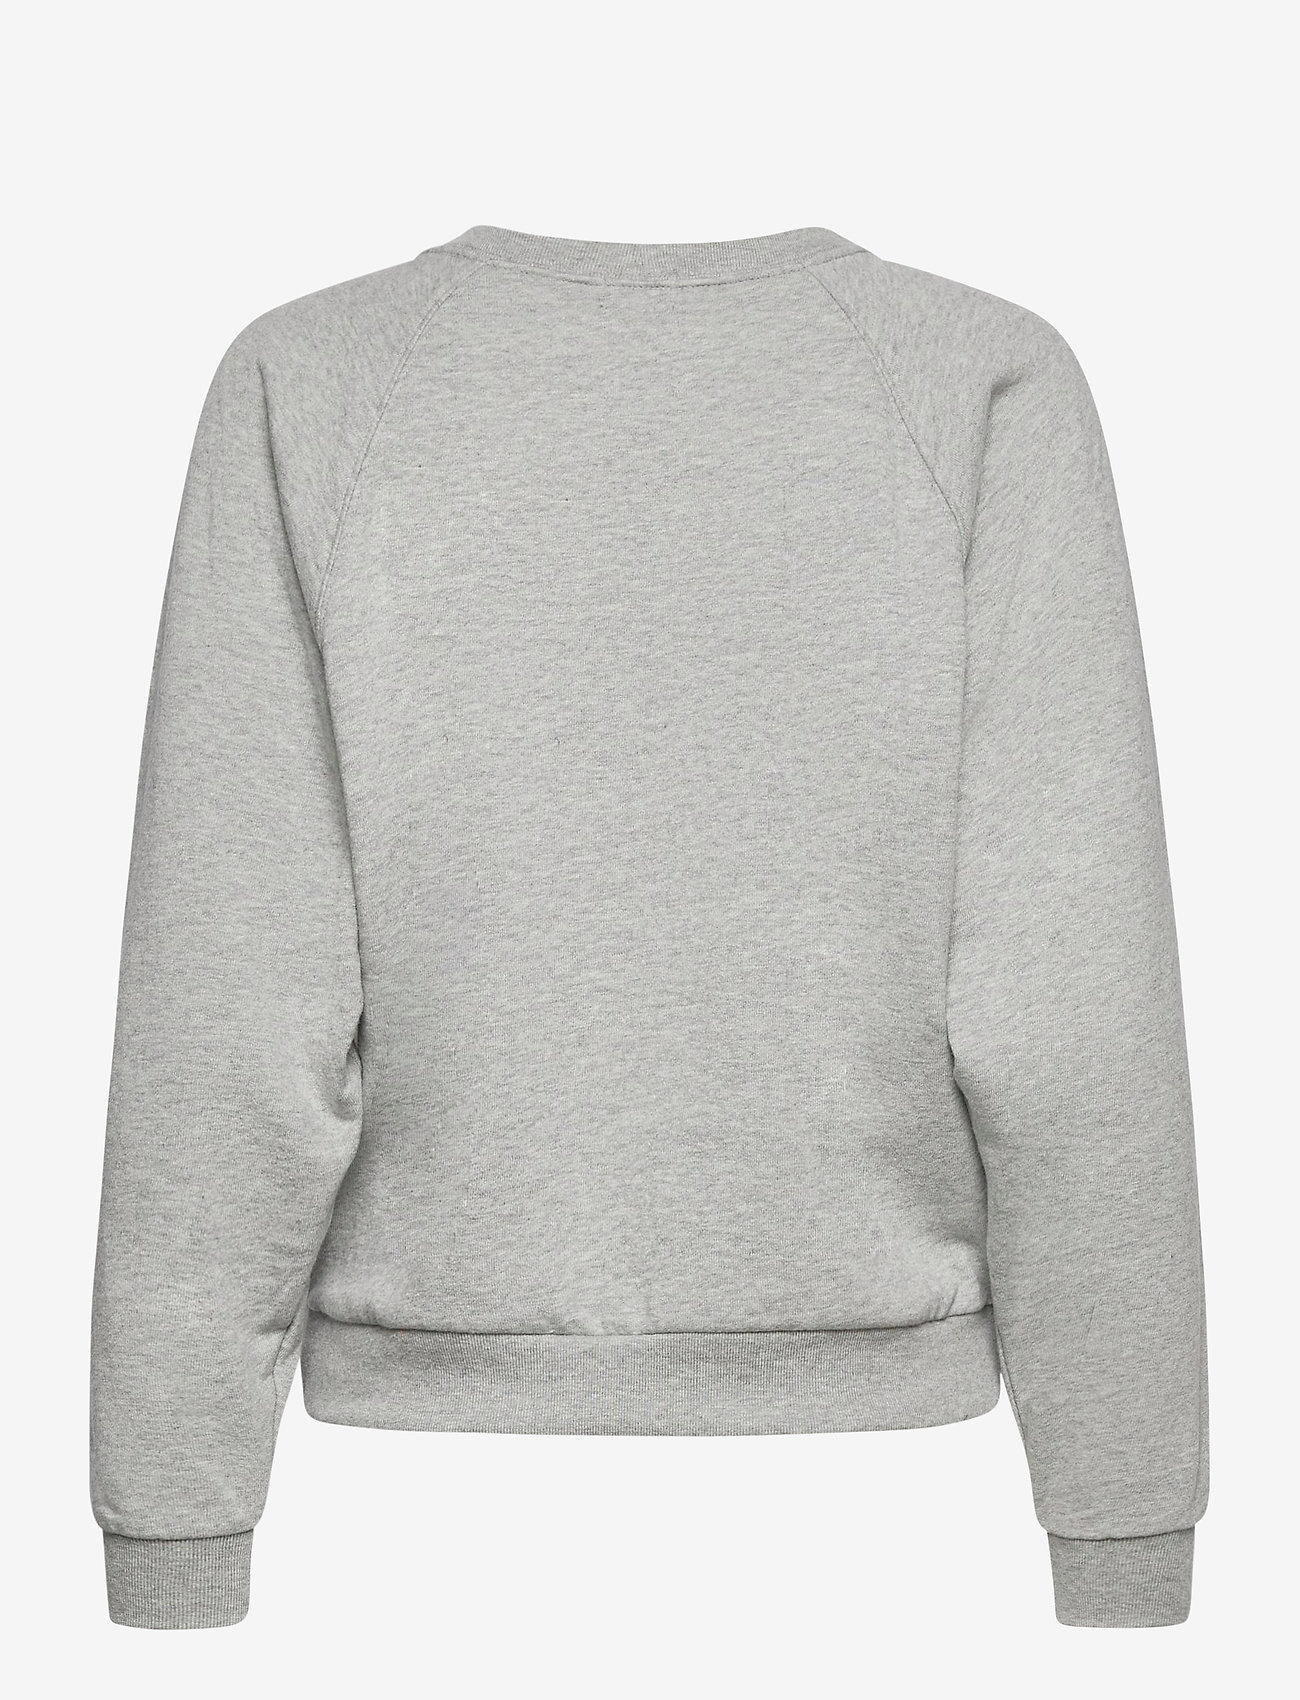 GAP - Gap Logo Raglan Crewneck Sweatshirt - sweatshirts - b10 grey heather - 1